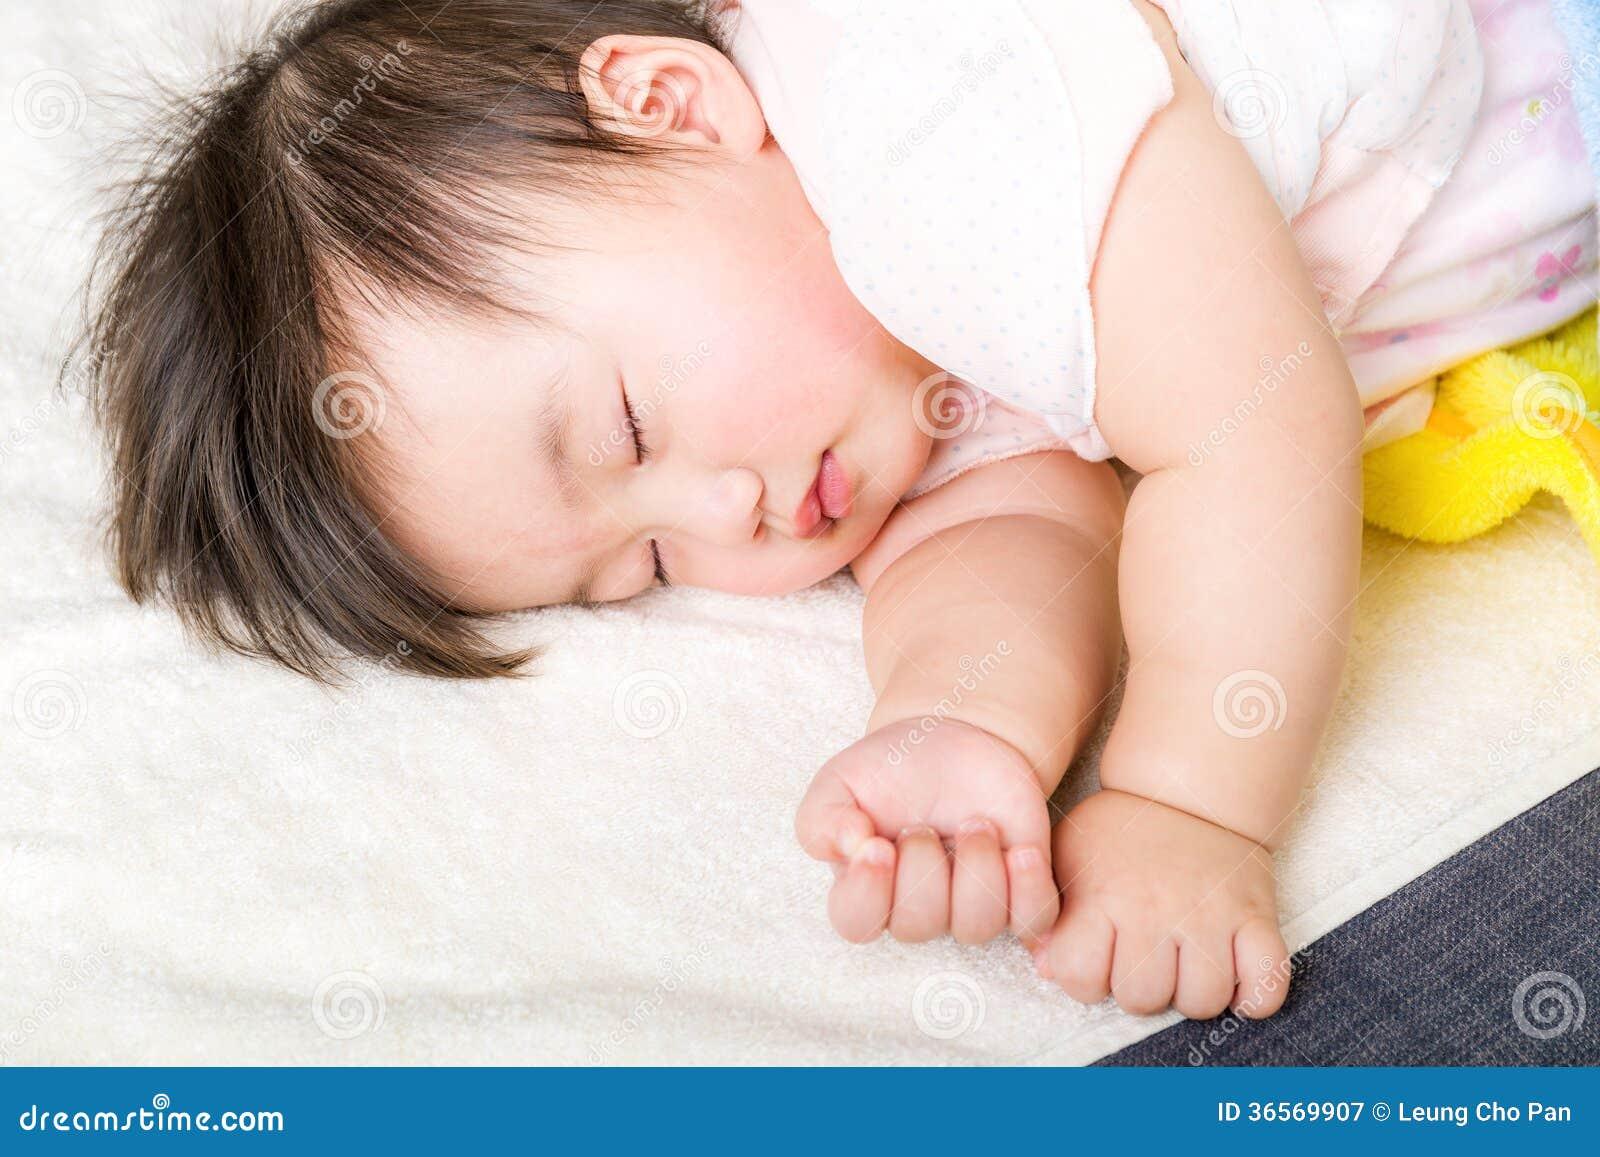 Asian little baby sleeping